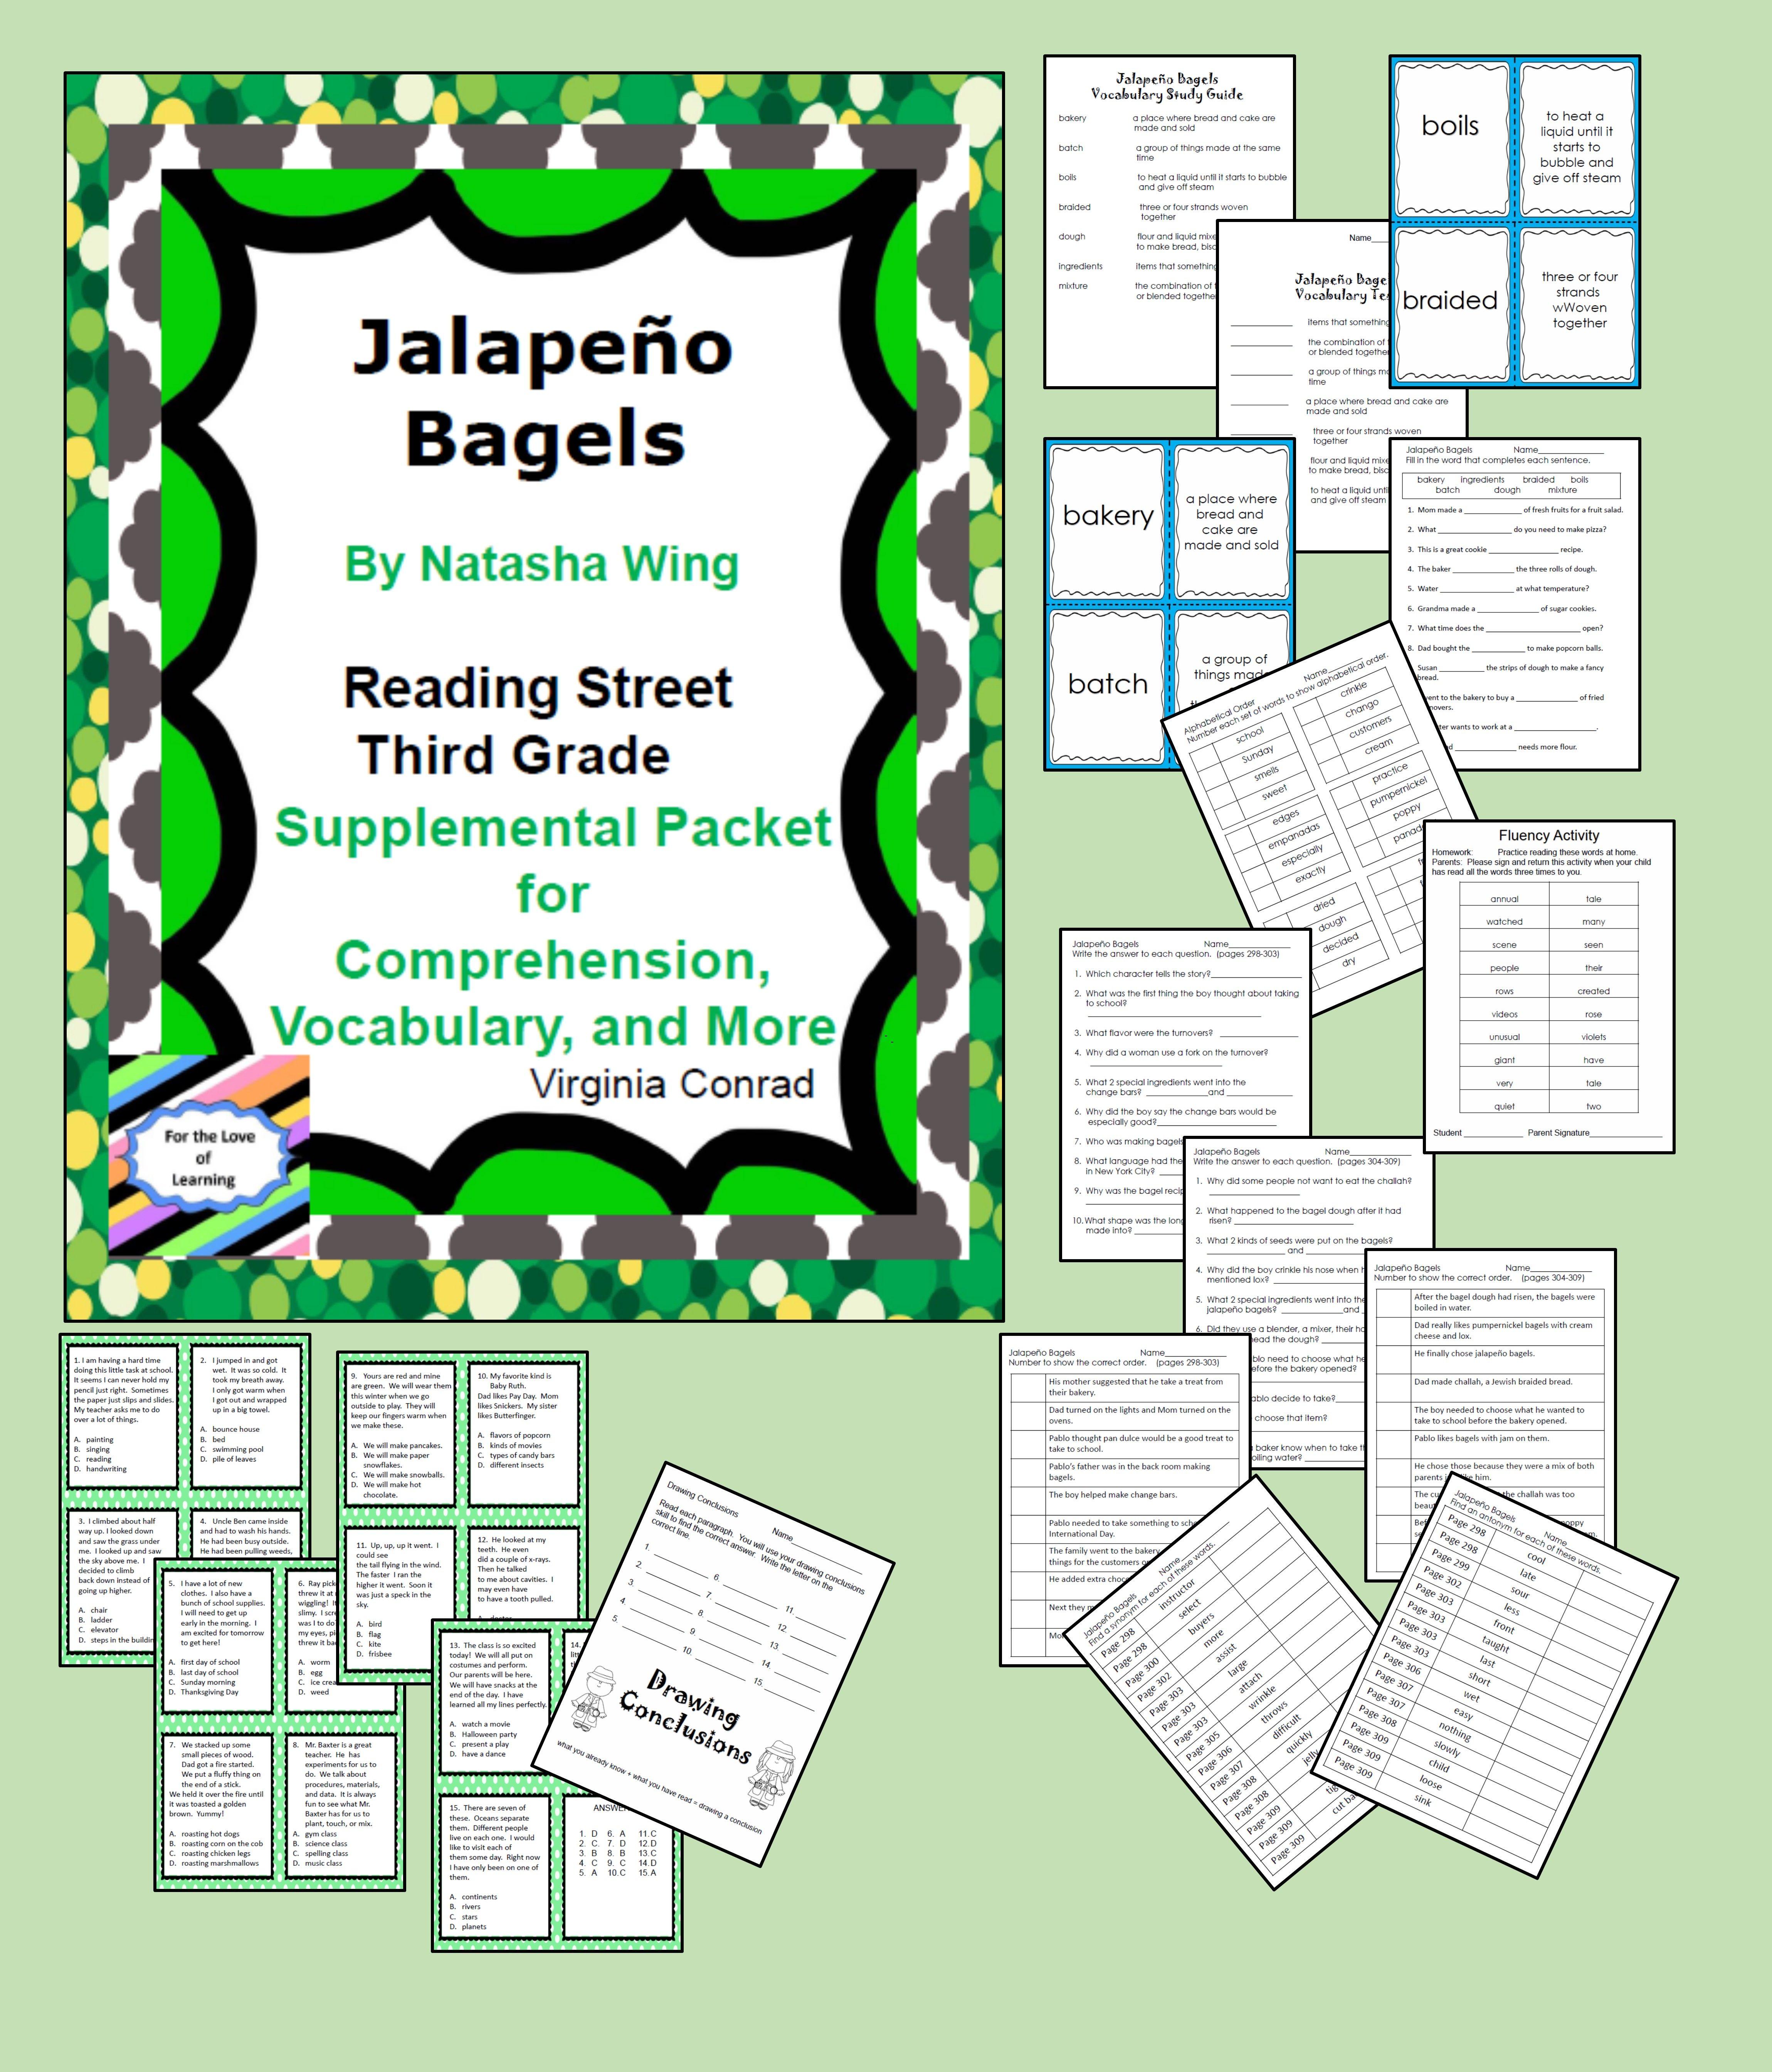 Jalapeno Bagels Supplemental Packet Reading Street Third